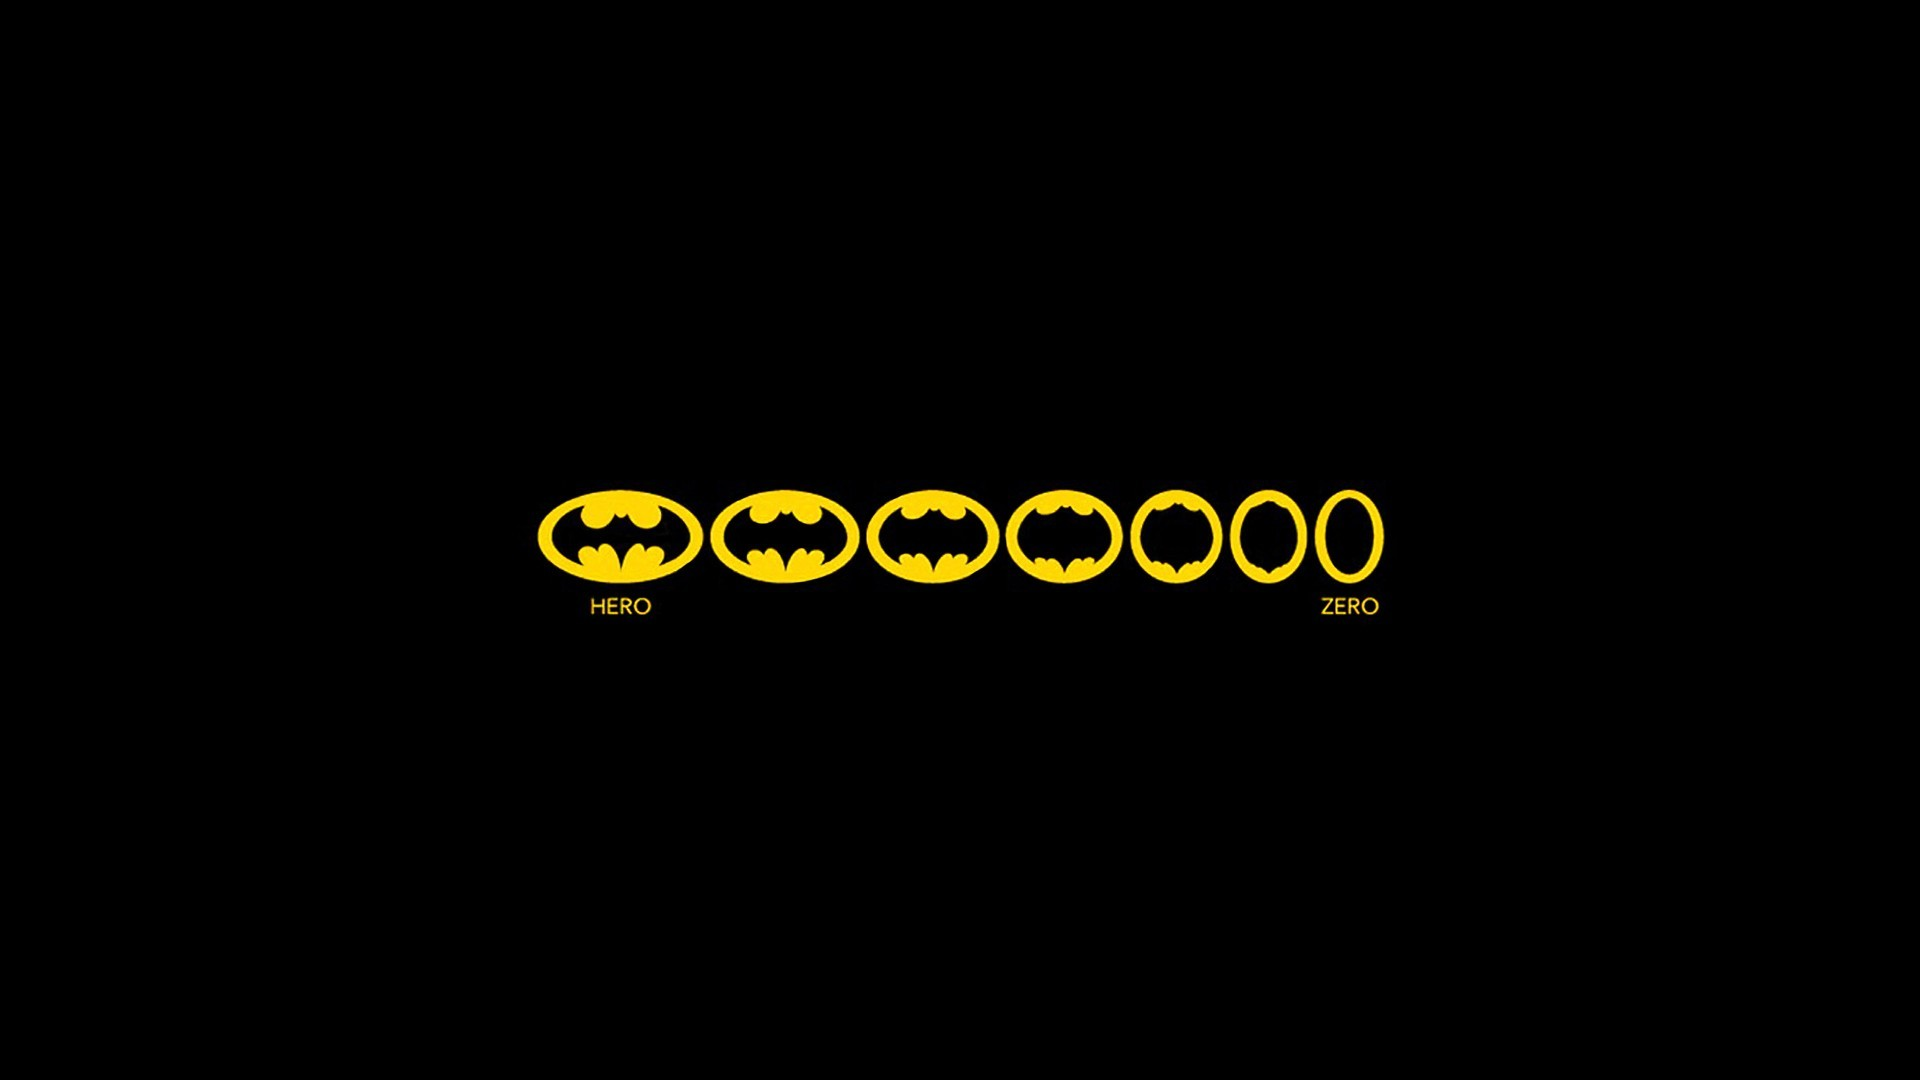 4K <b>Batman Wallpaper</b> – WallpaperSafari